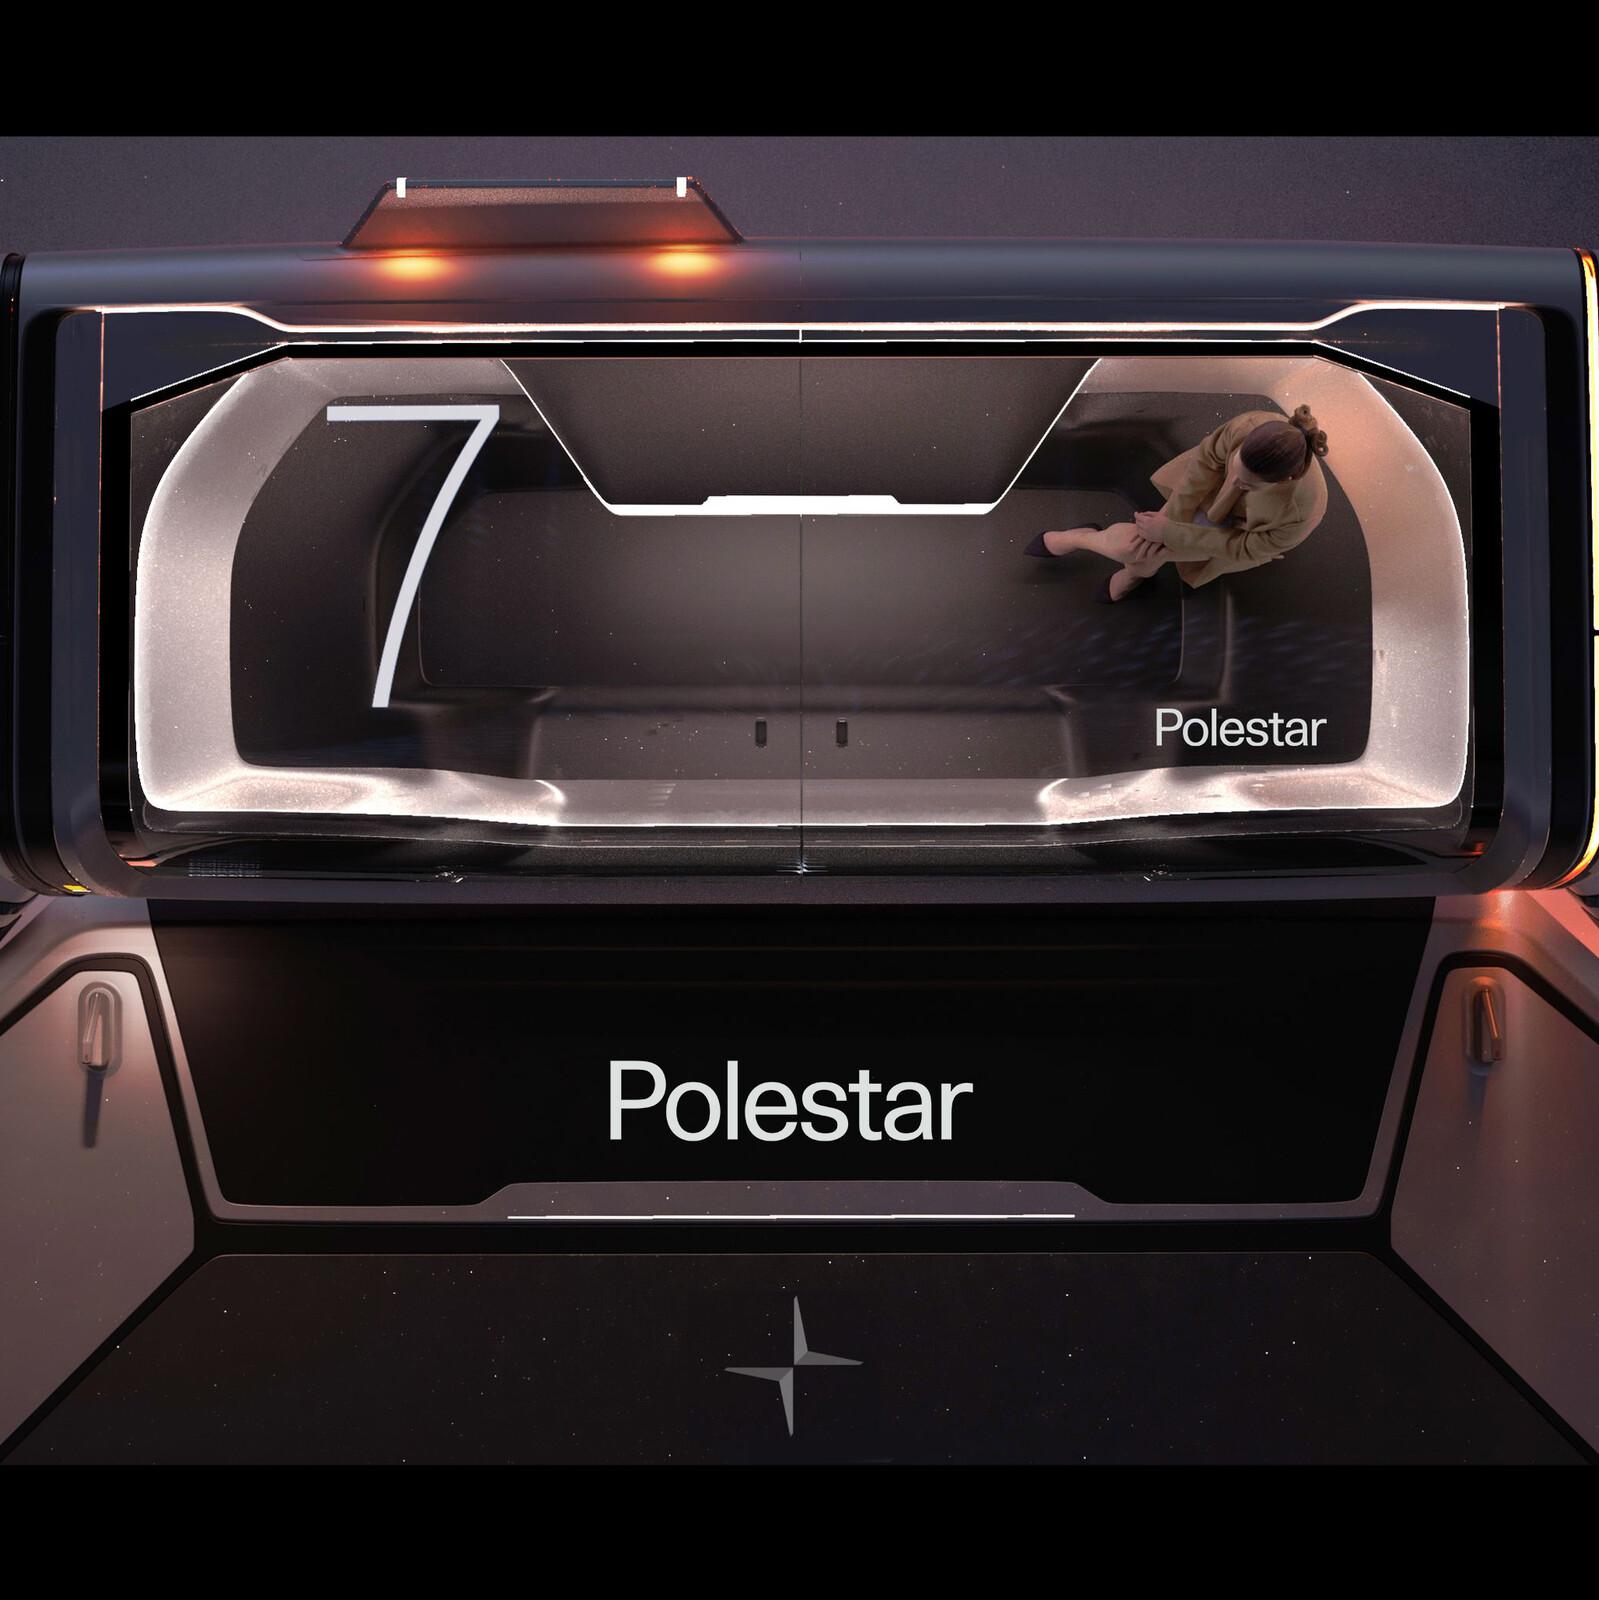 Polestar Design Contest submission